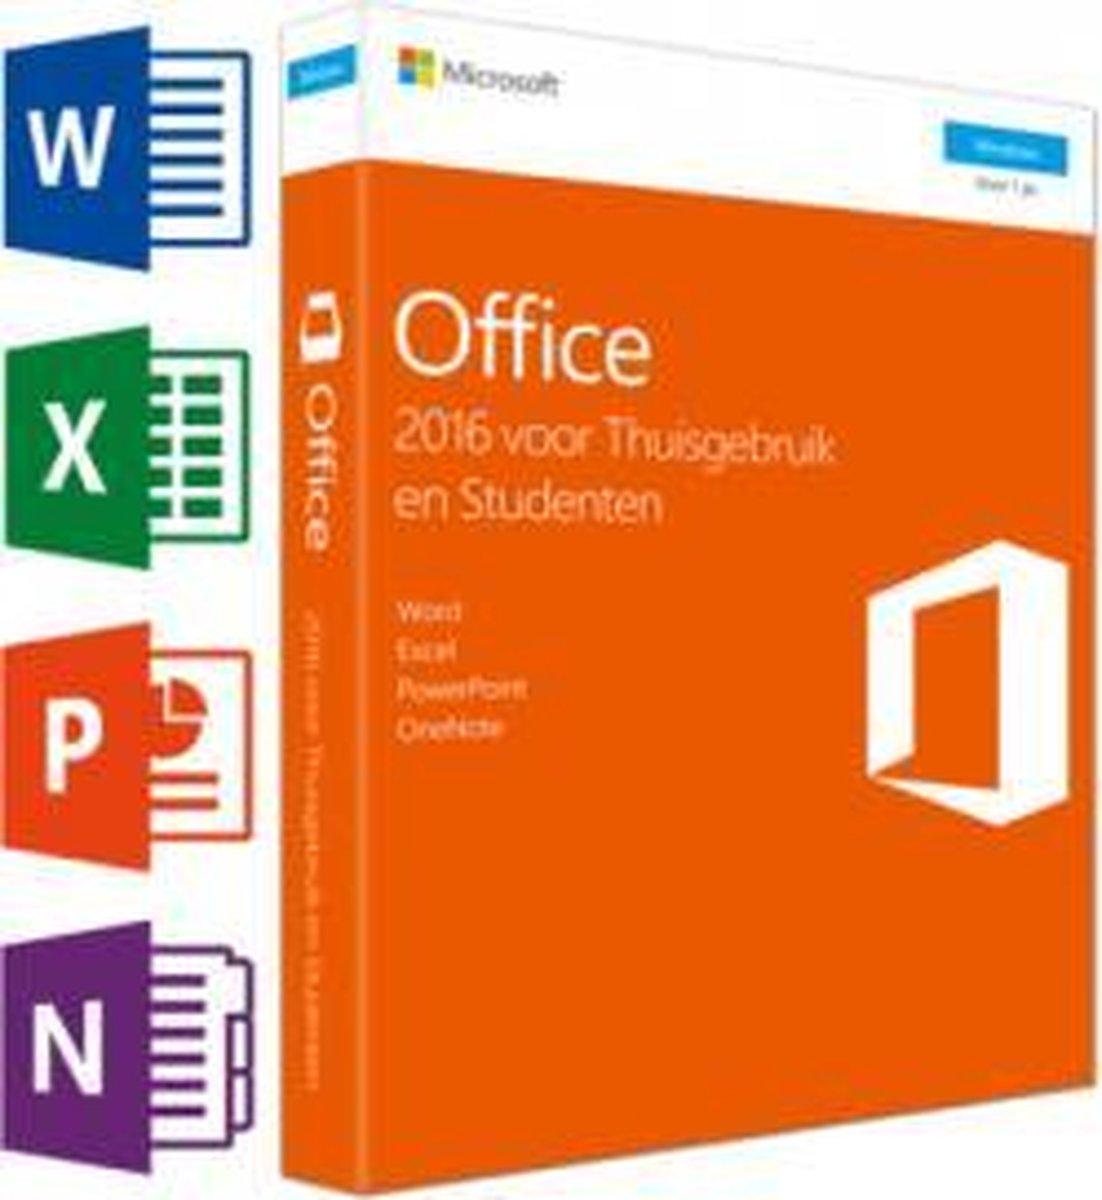 Microsoft Office 2016 - Home & Student - Windows - Nederlandstalig